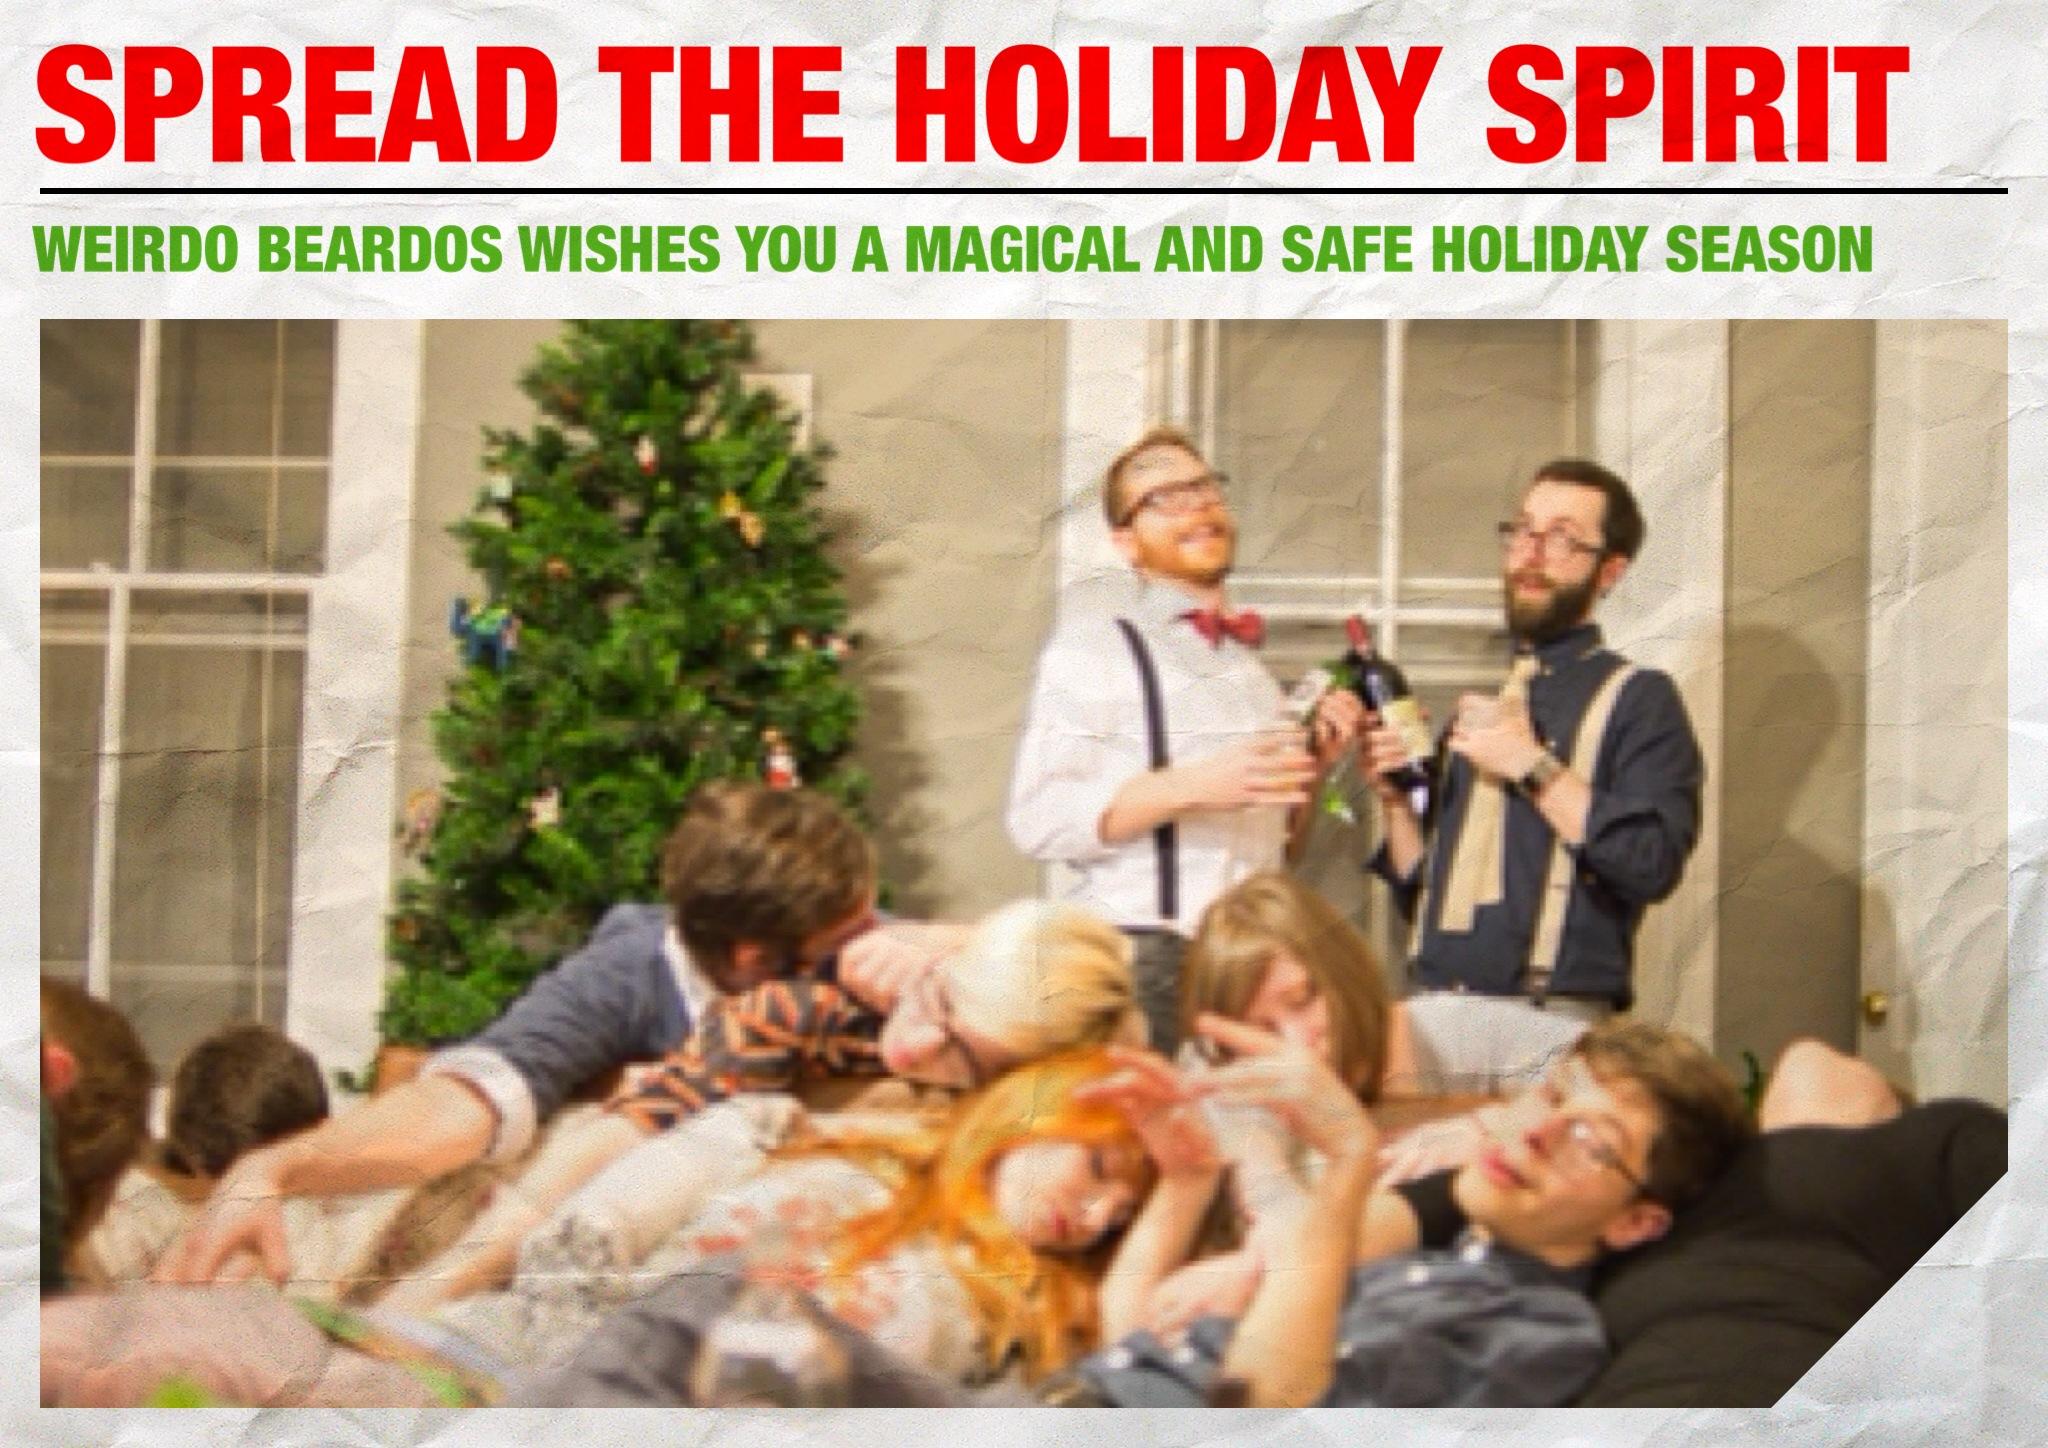 01 - Spread the Holiday Spirit.jpg